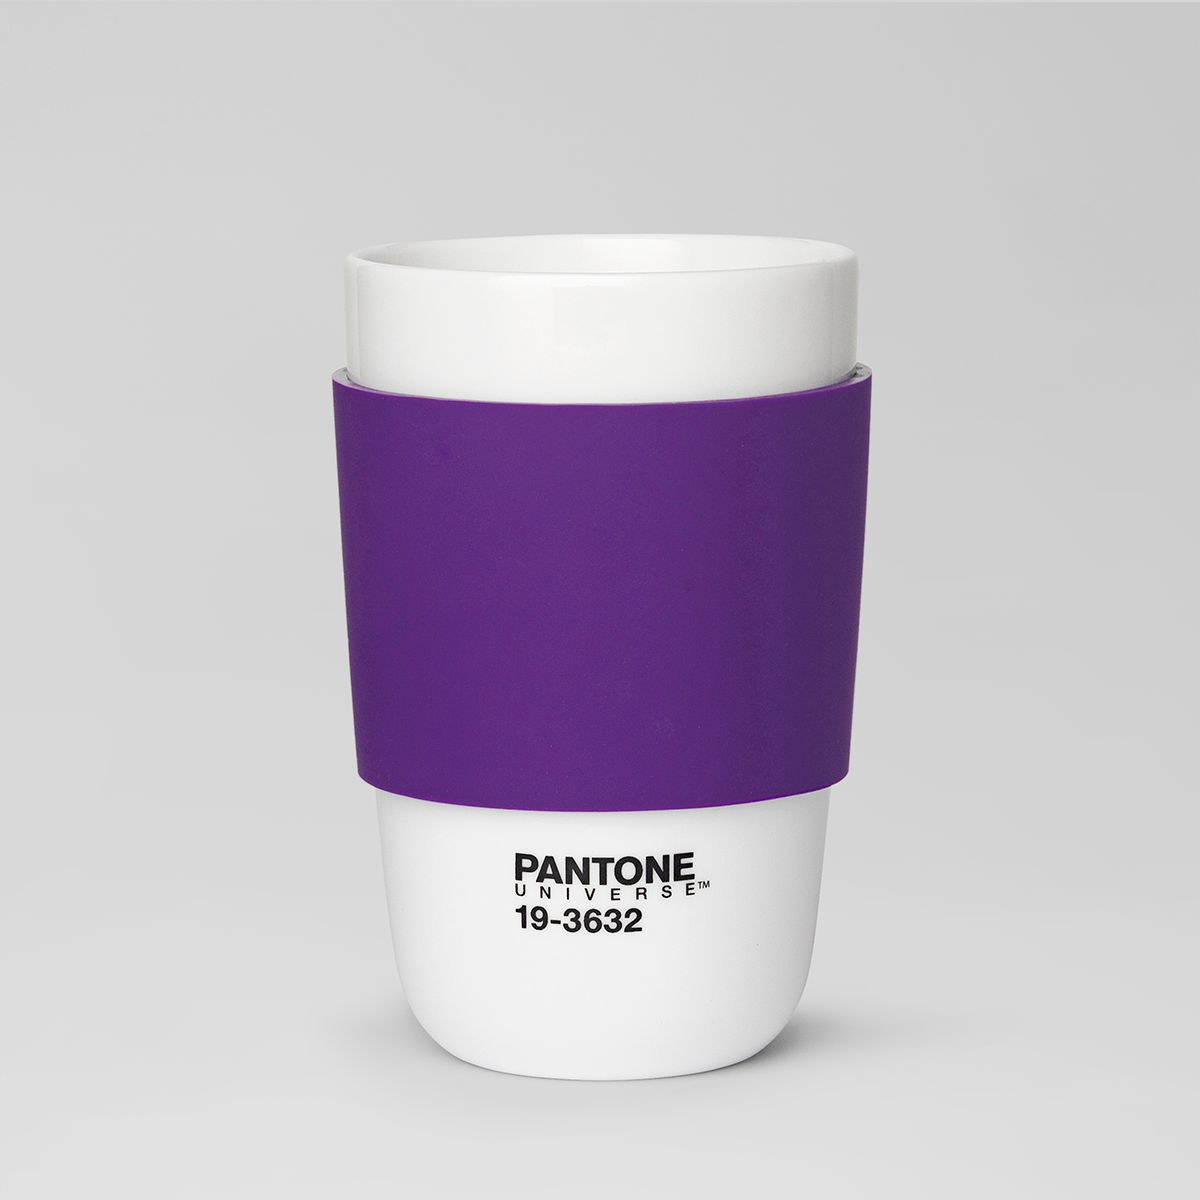 10102-PANTONE-Universe-Cup-Classic_Petunia-19-3632